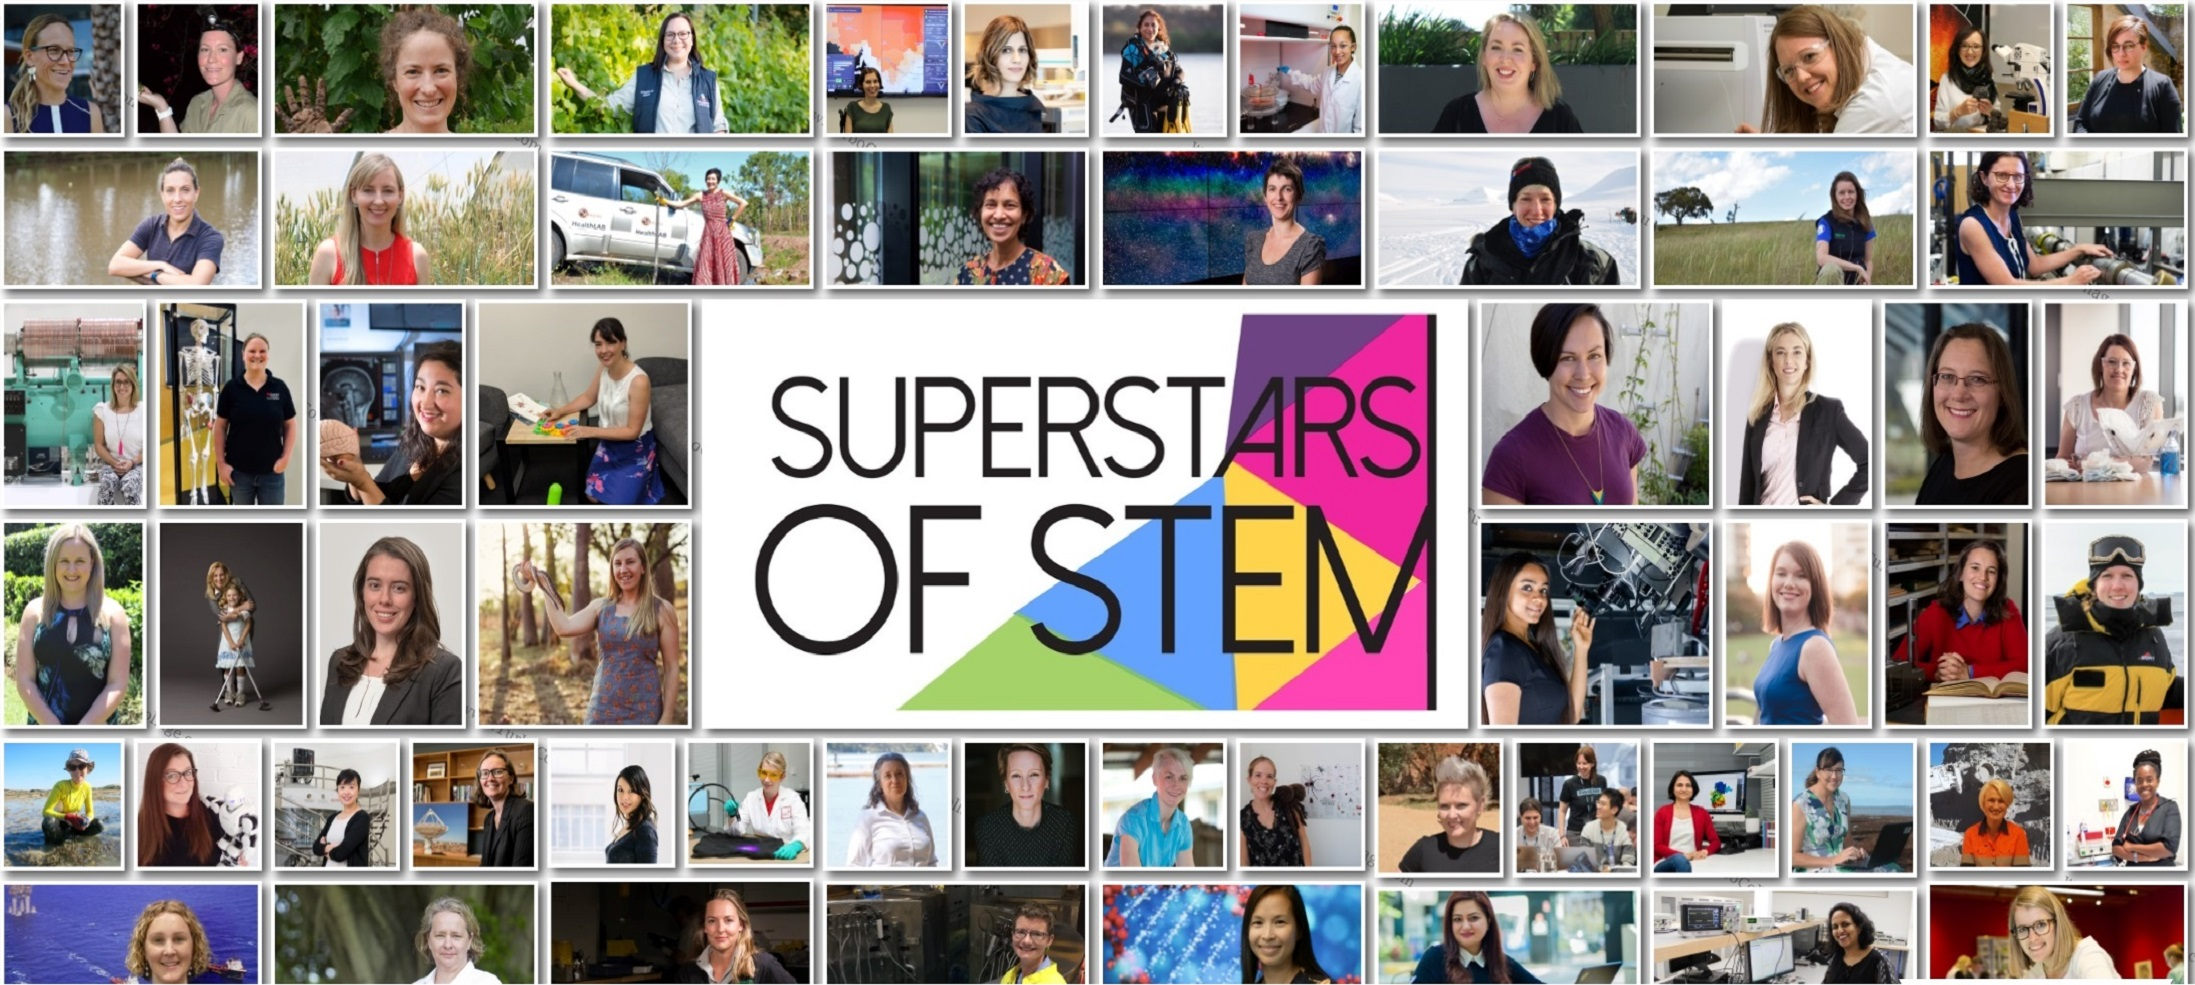 Collage of Superstars of STEM 2019